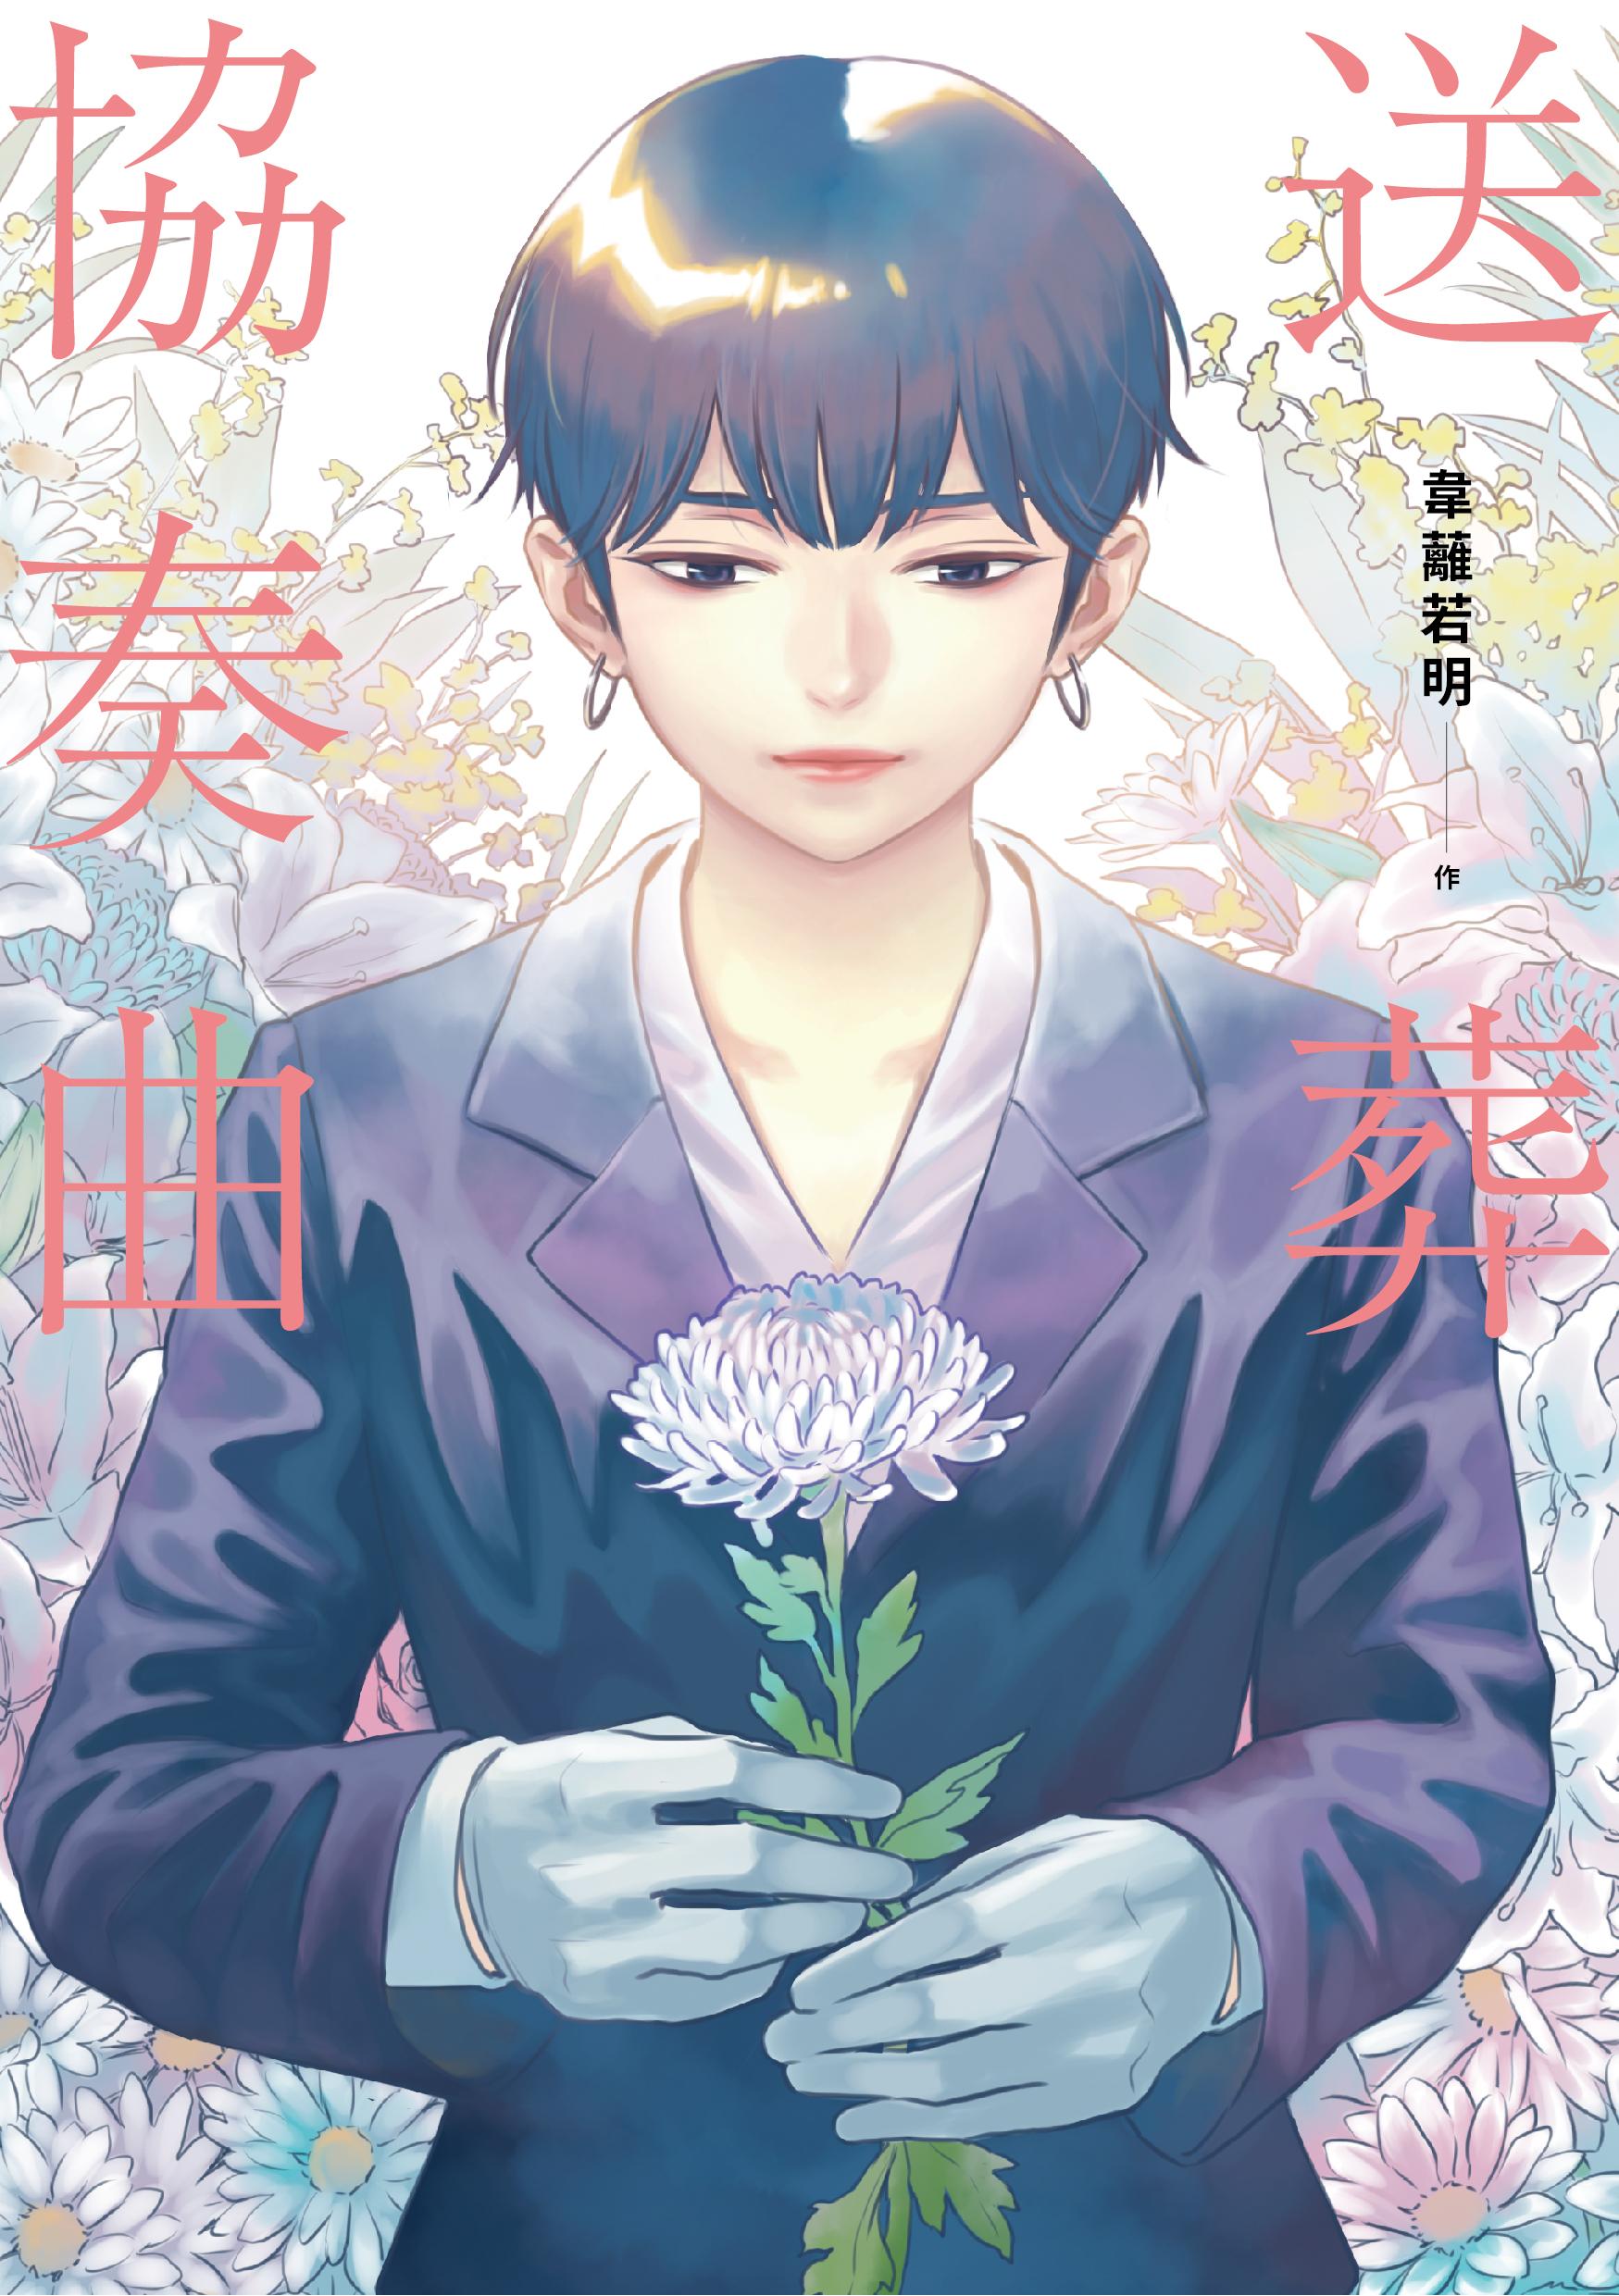 Taiwan's manga artists win top prizes at the 14th Japan International Manga Award